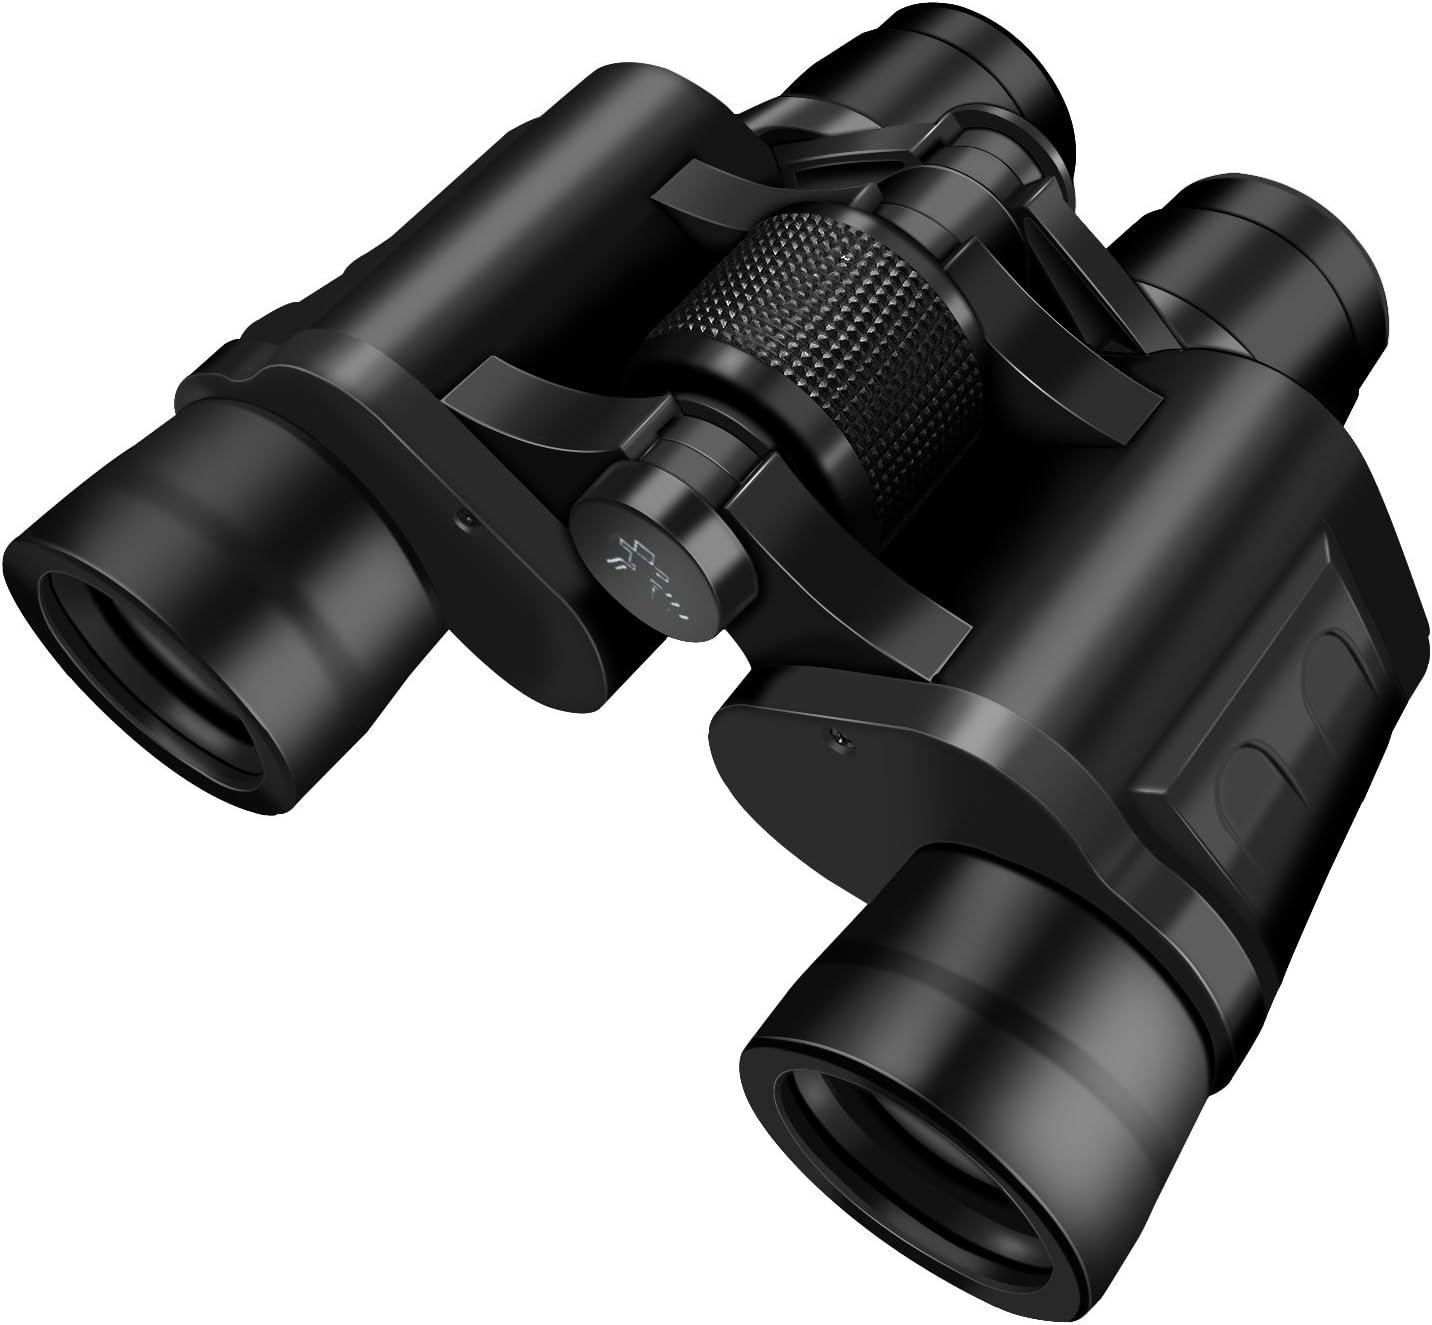 icemoon Compact 8 x40 Binoculars for Adults, Folding Durable Binoculars for Bird Watching, Sports, Concerts, Living Waterproof